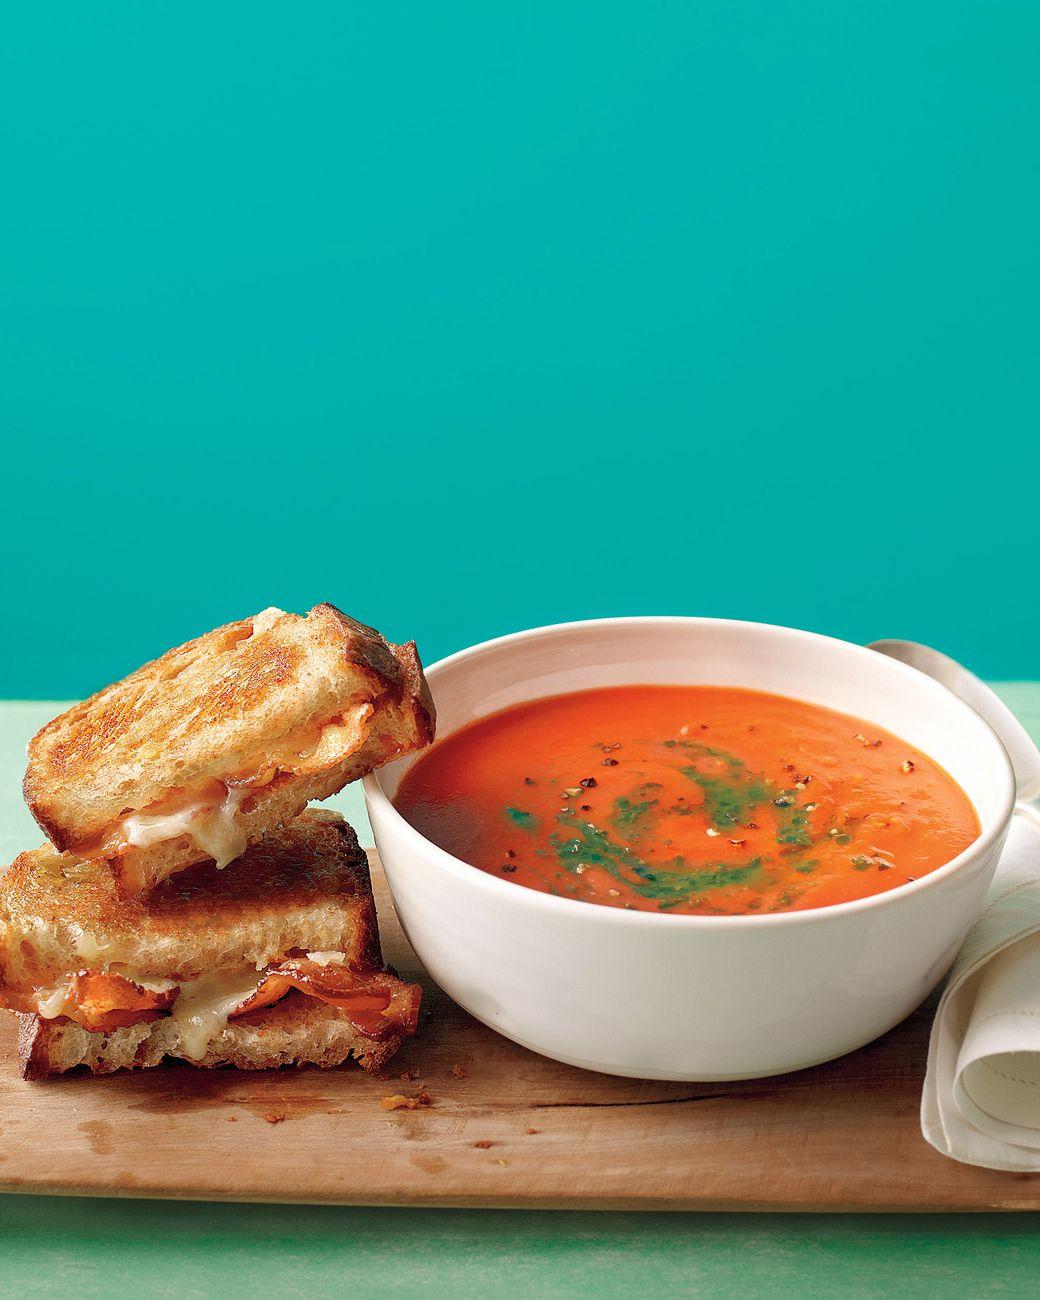 Cheesies-pub-and-grub--mac and cheese sandwich | Grilled Cheese ...